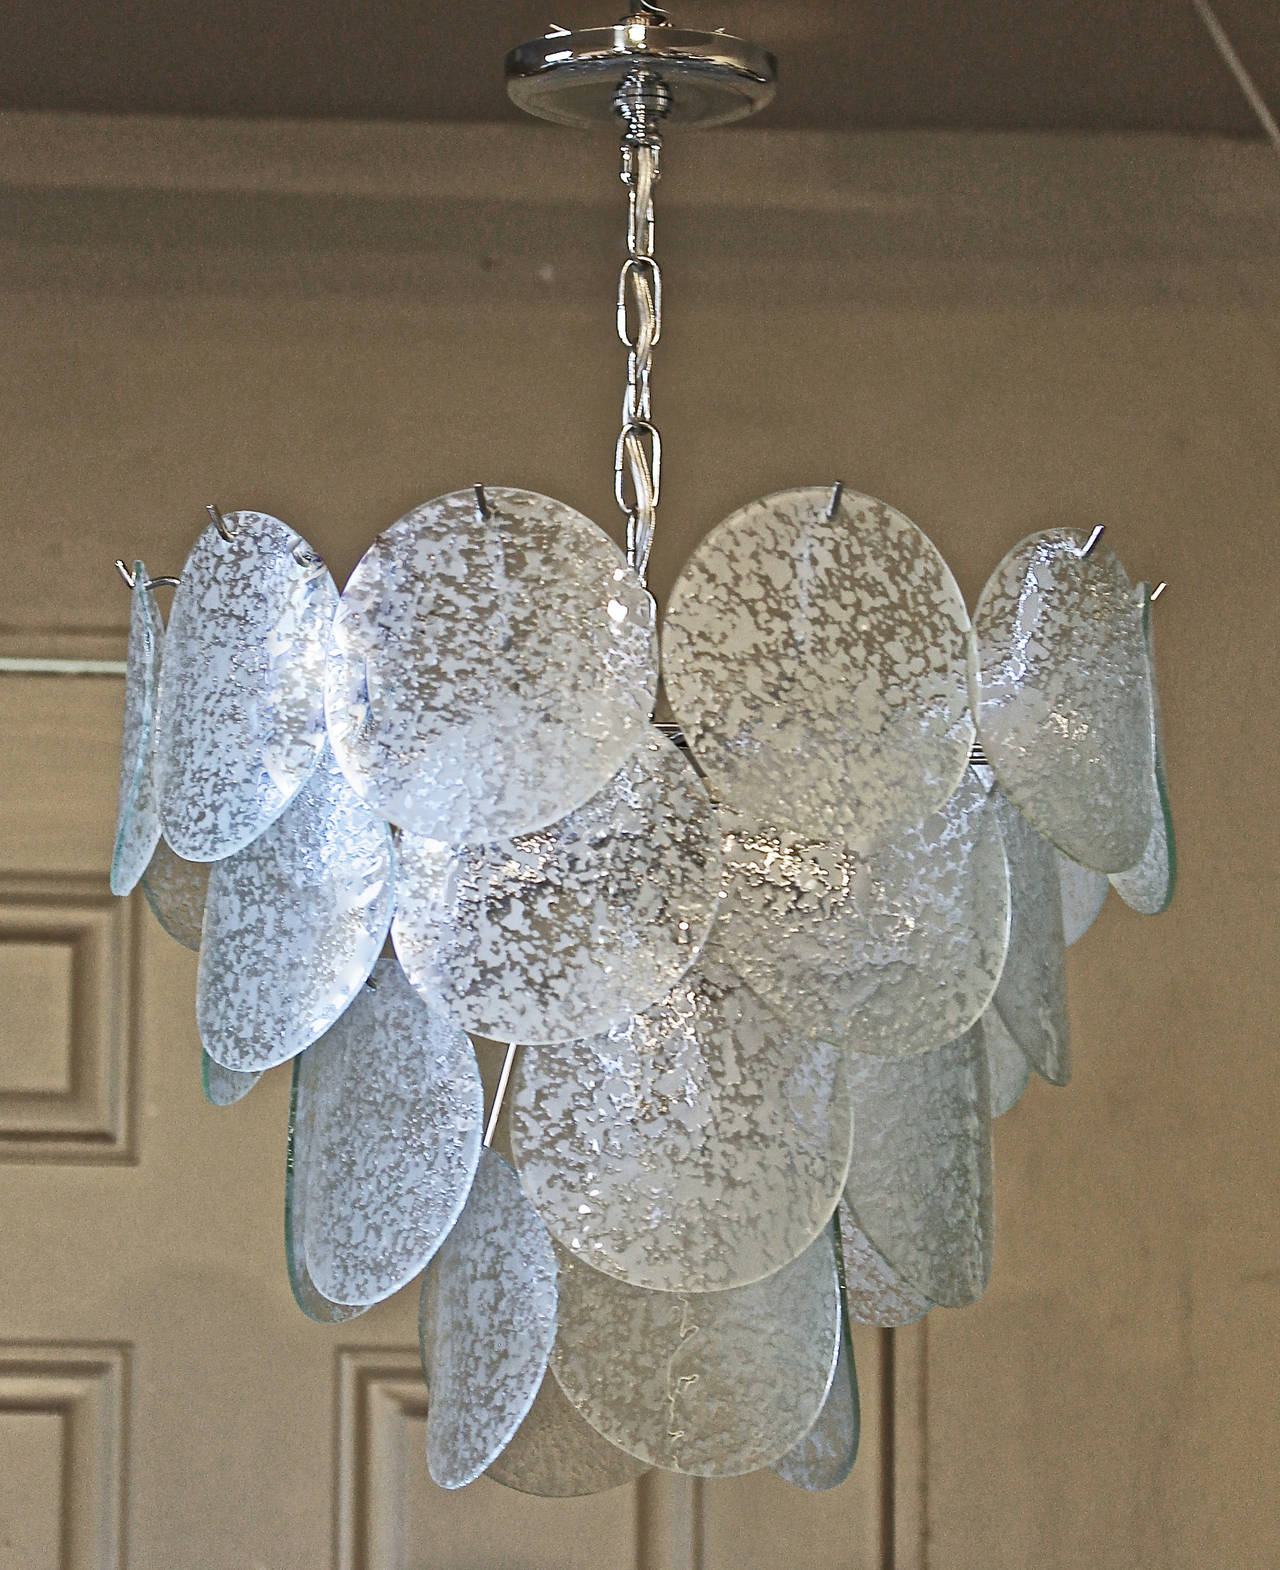 Italian glass chandelier chandelier designs italian glass chandelier design ideas aloadofball Choice Image